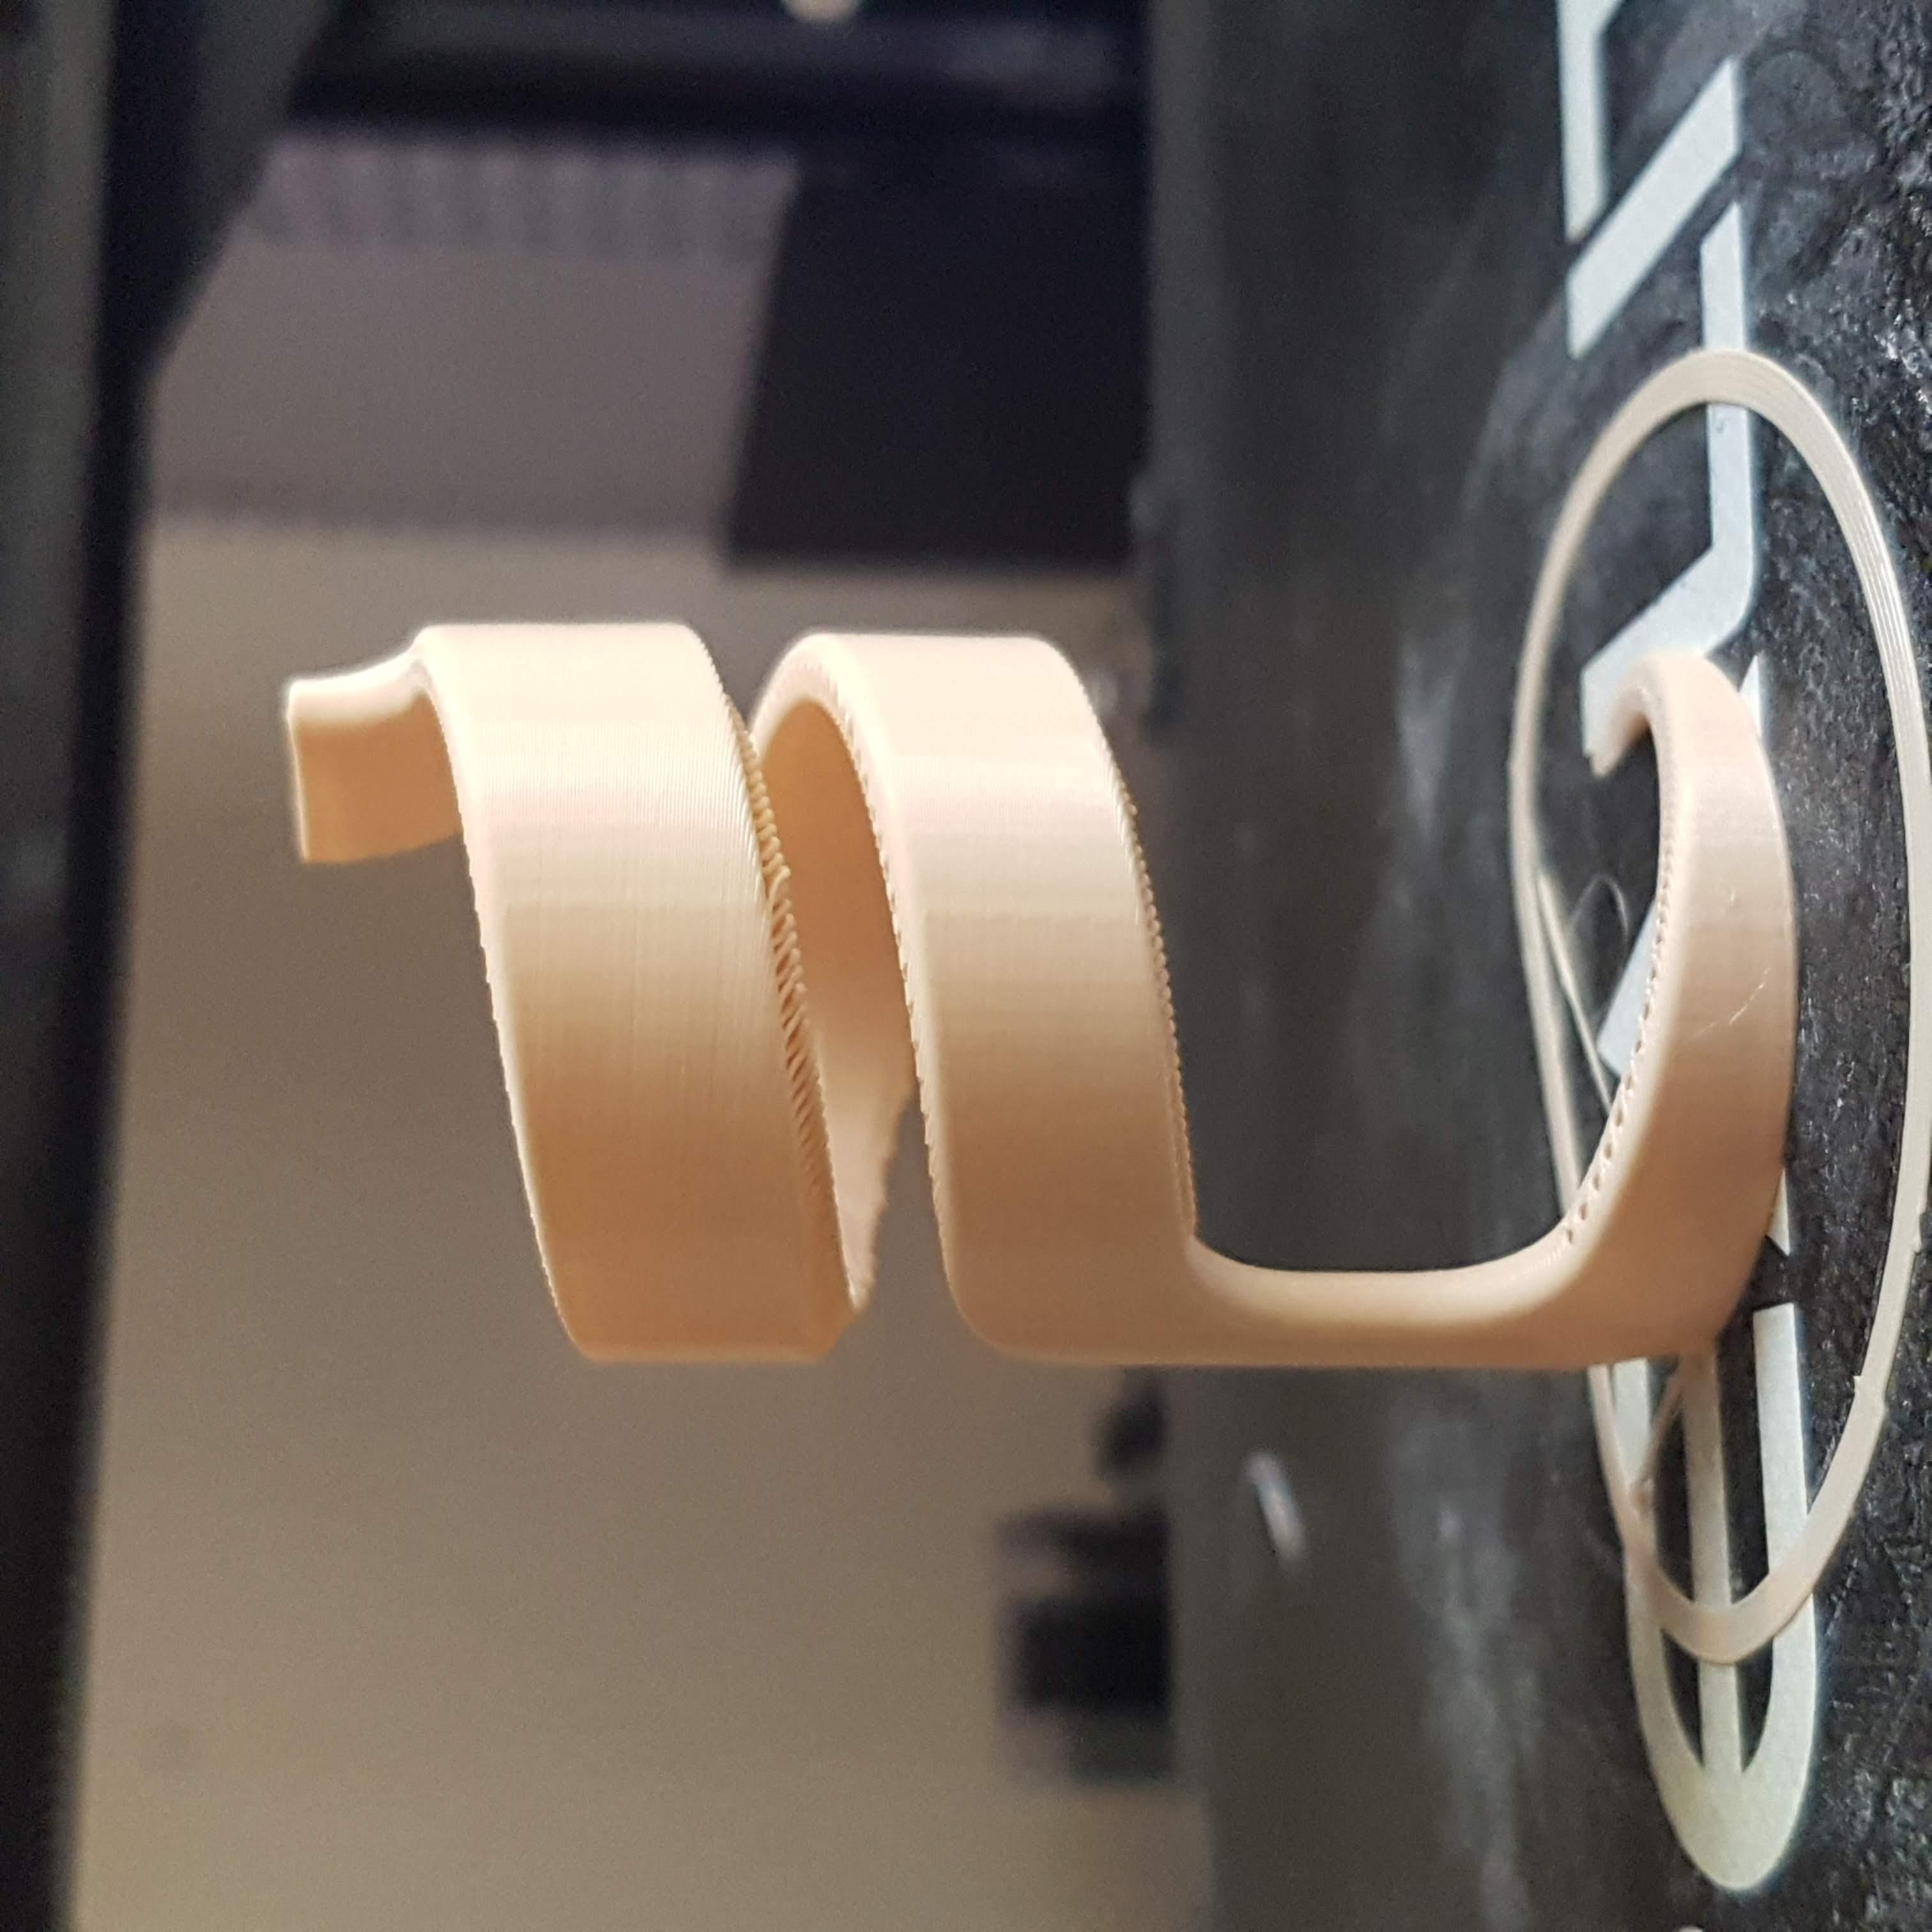 20191019_143614.jpg Download free STL file 80° degree twist (Benchmark model) • 3D print template, extreme3dprint